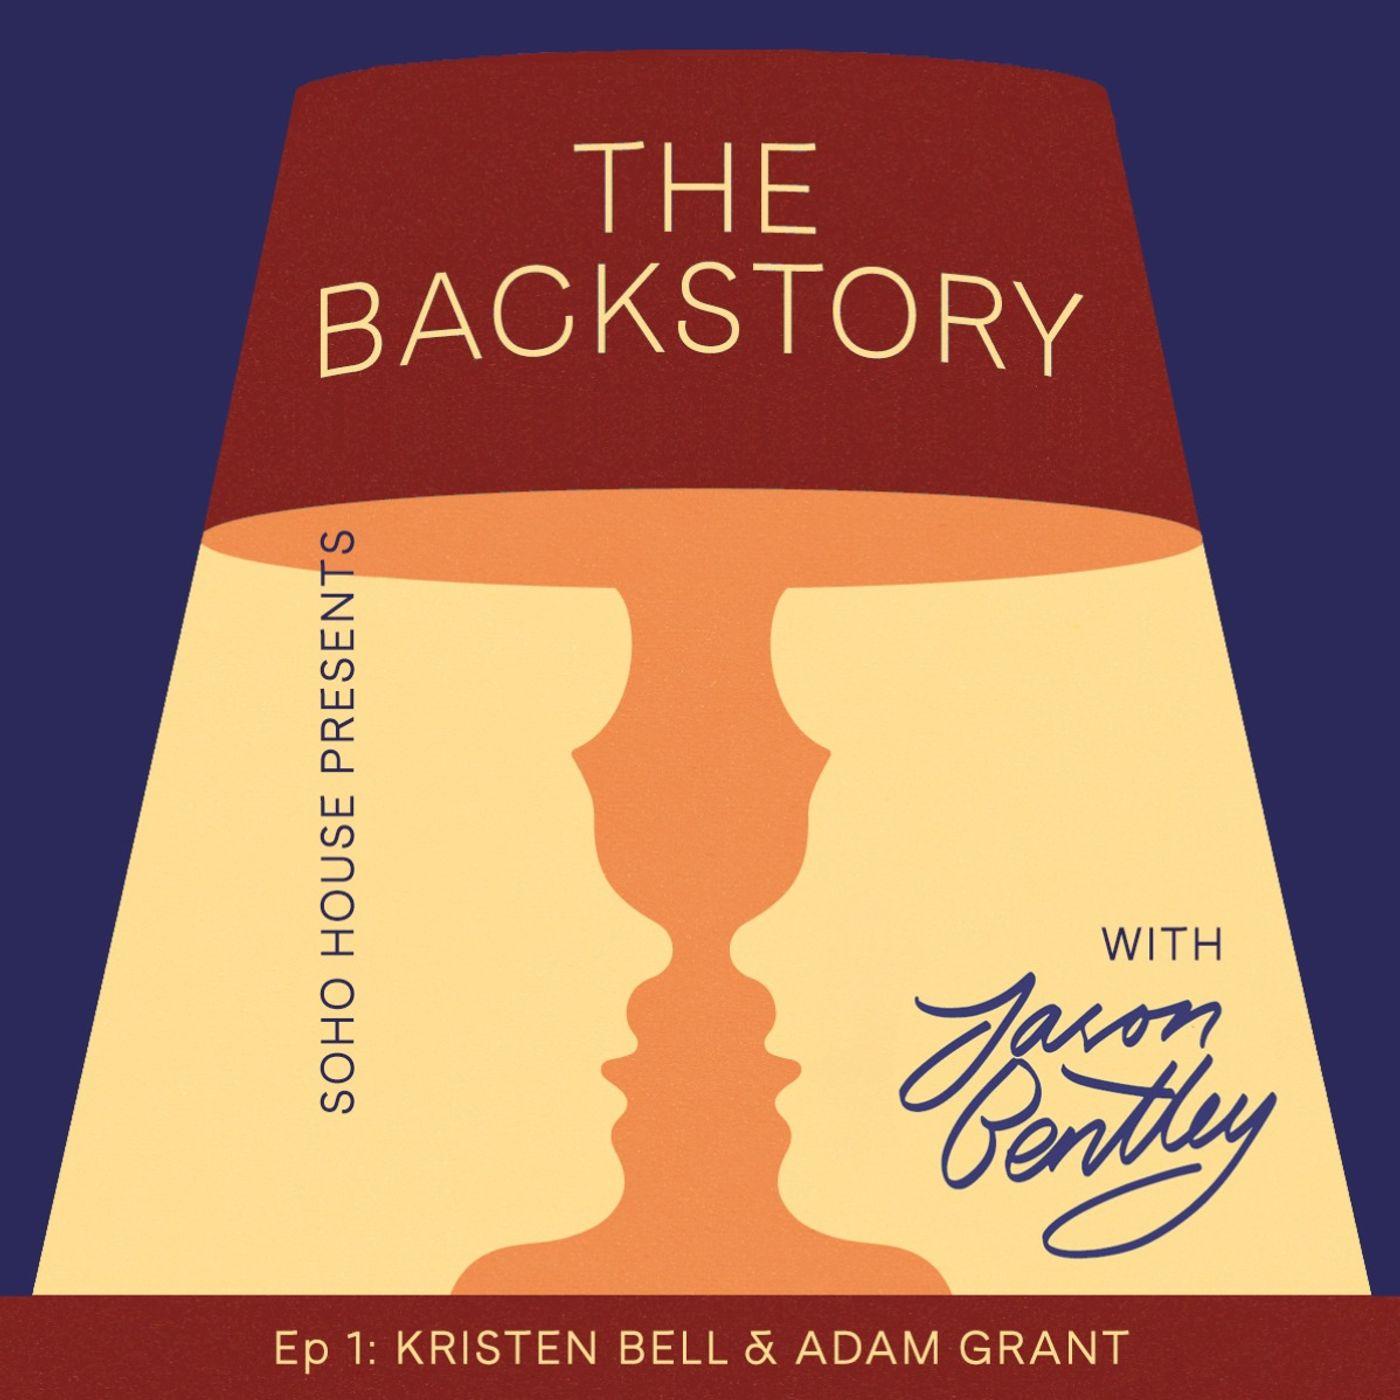 Kristen Bell & Adam Grant